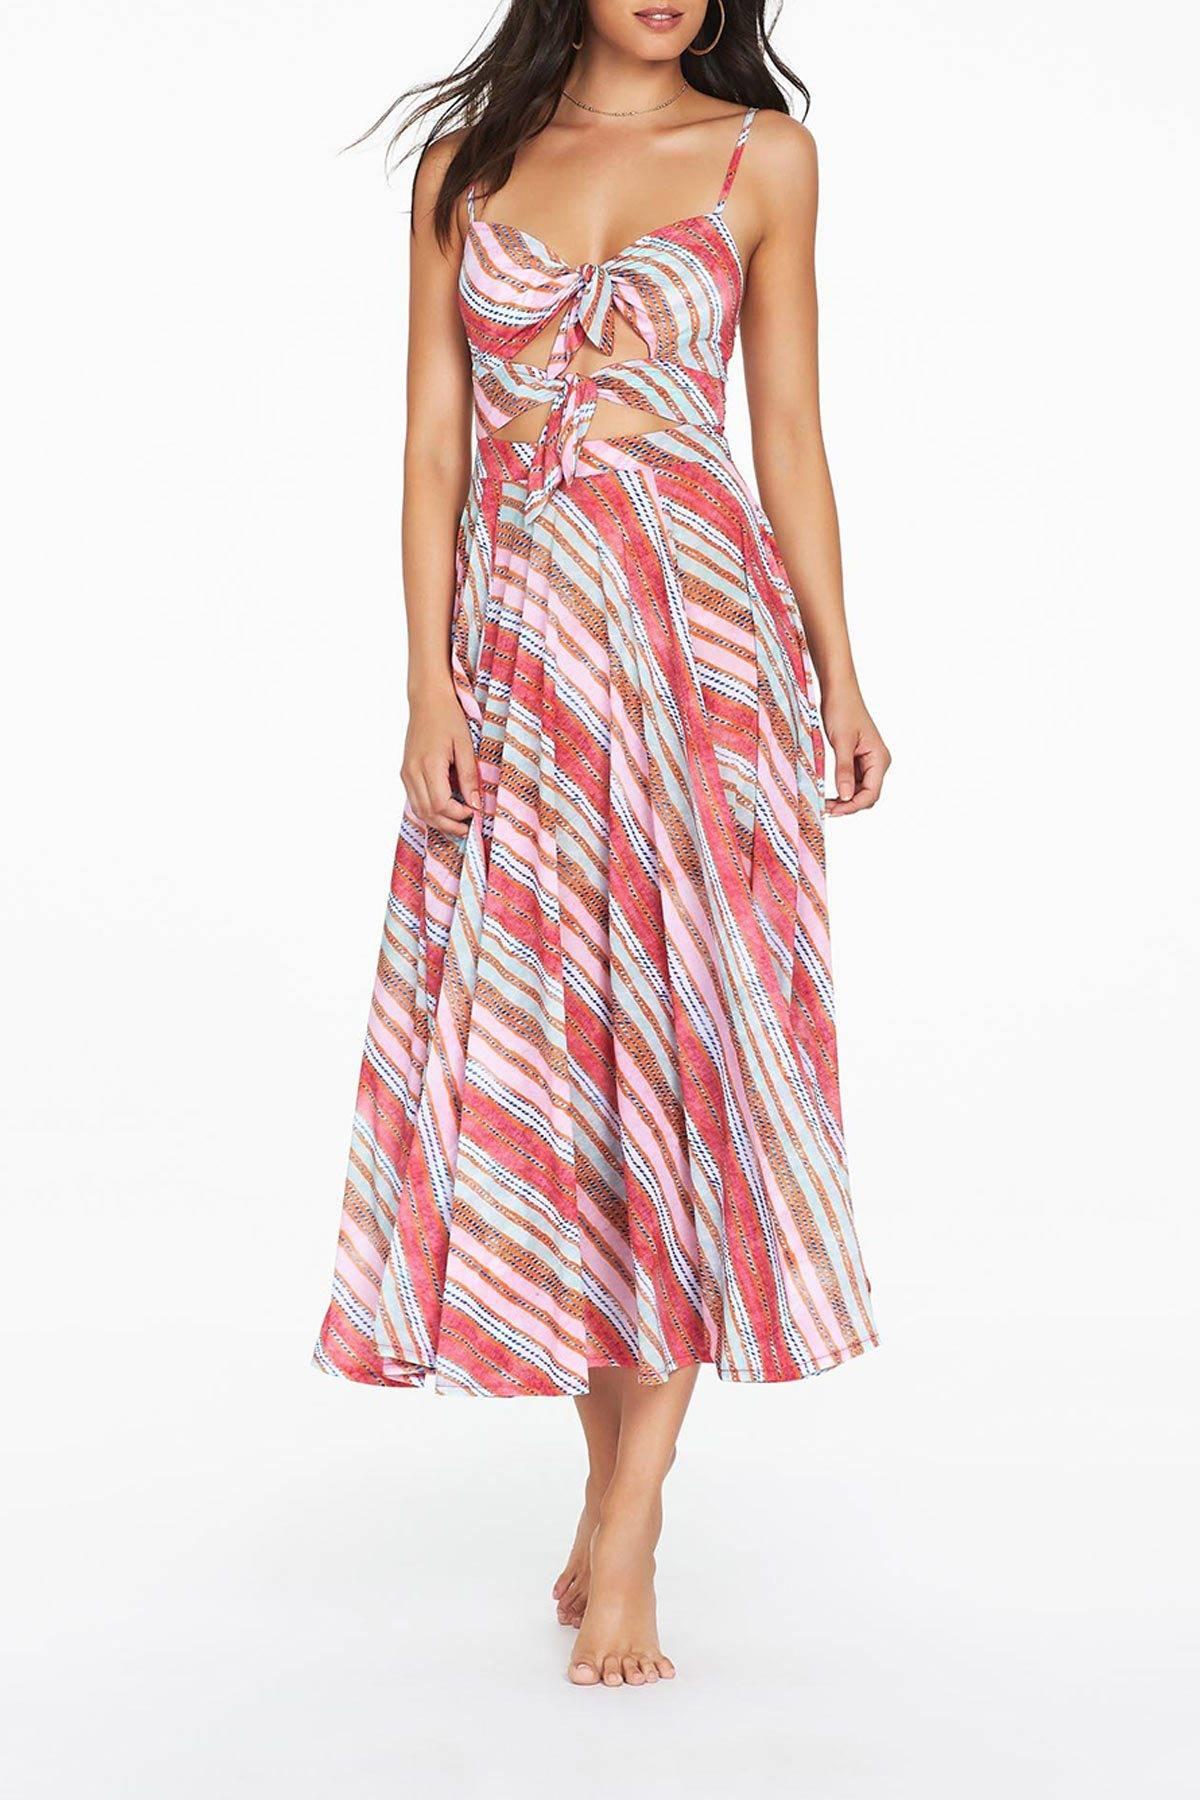 Womens Antheia Midi Dress - Multi Colour by Tigerlily